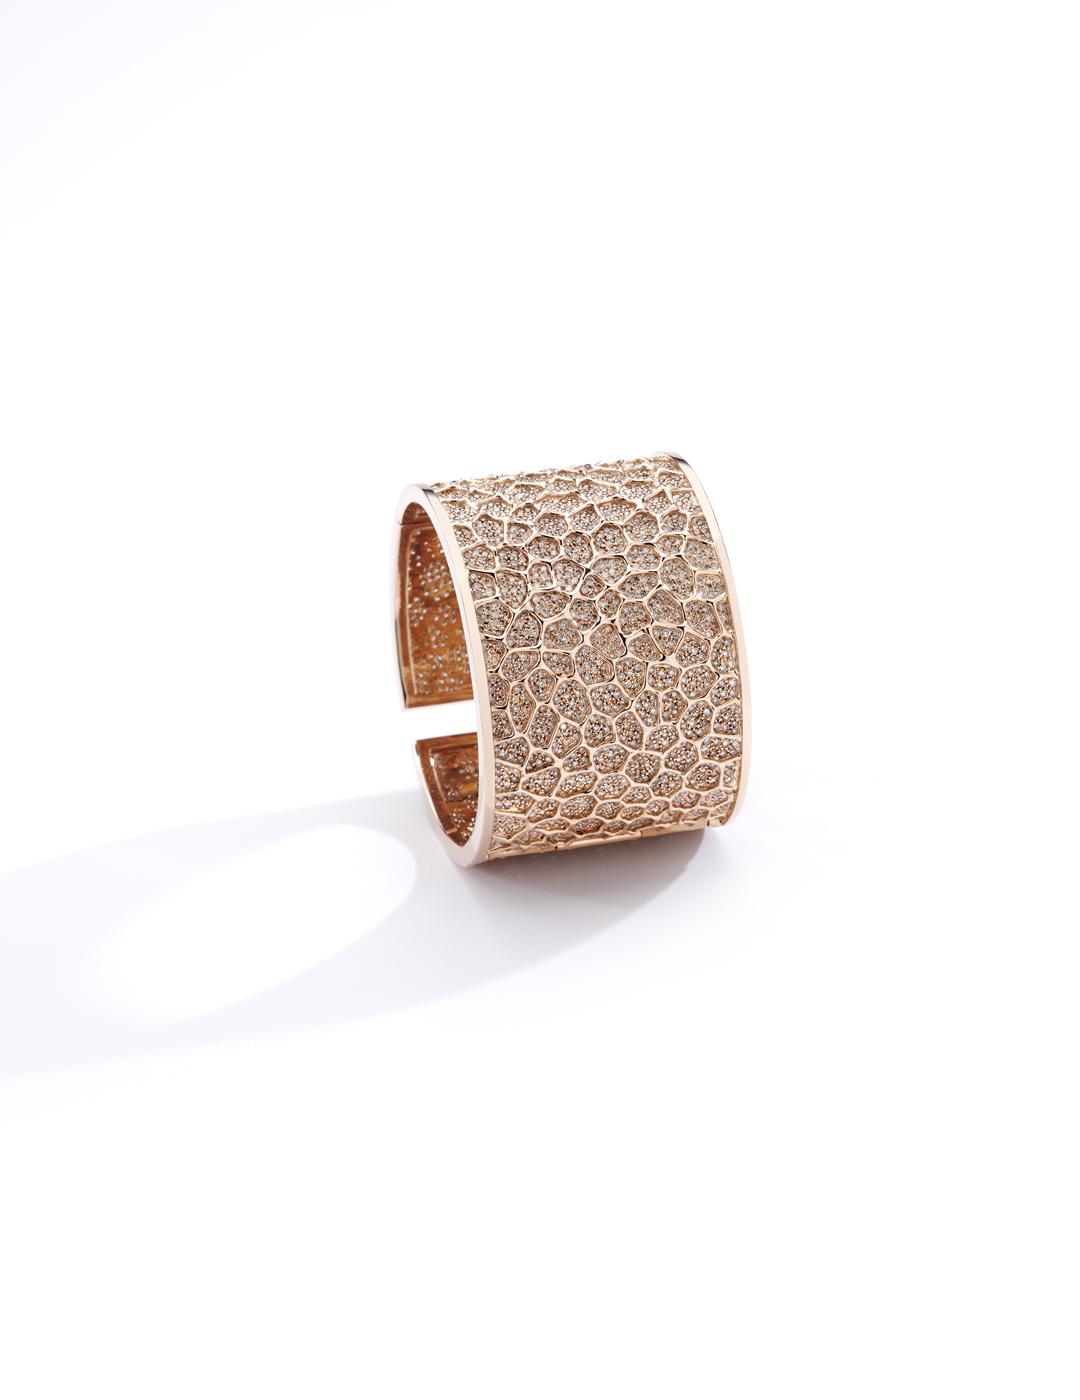 mish_jewelry_product_Honeywood-Cuff-RG-1